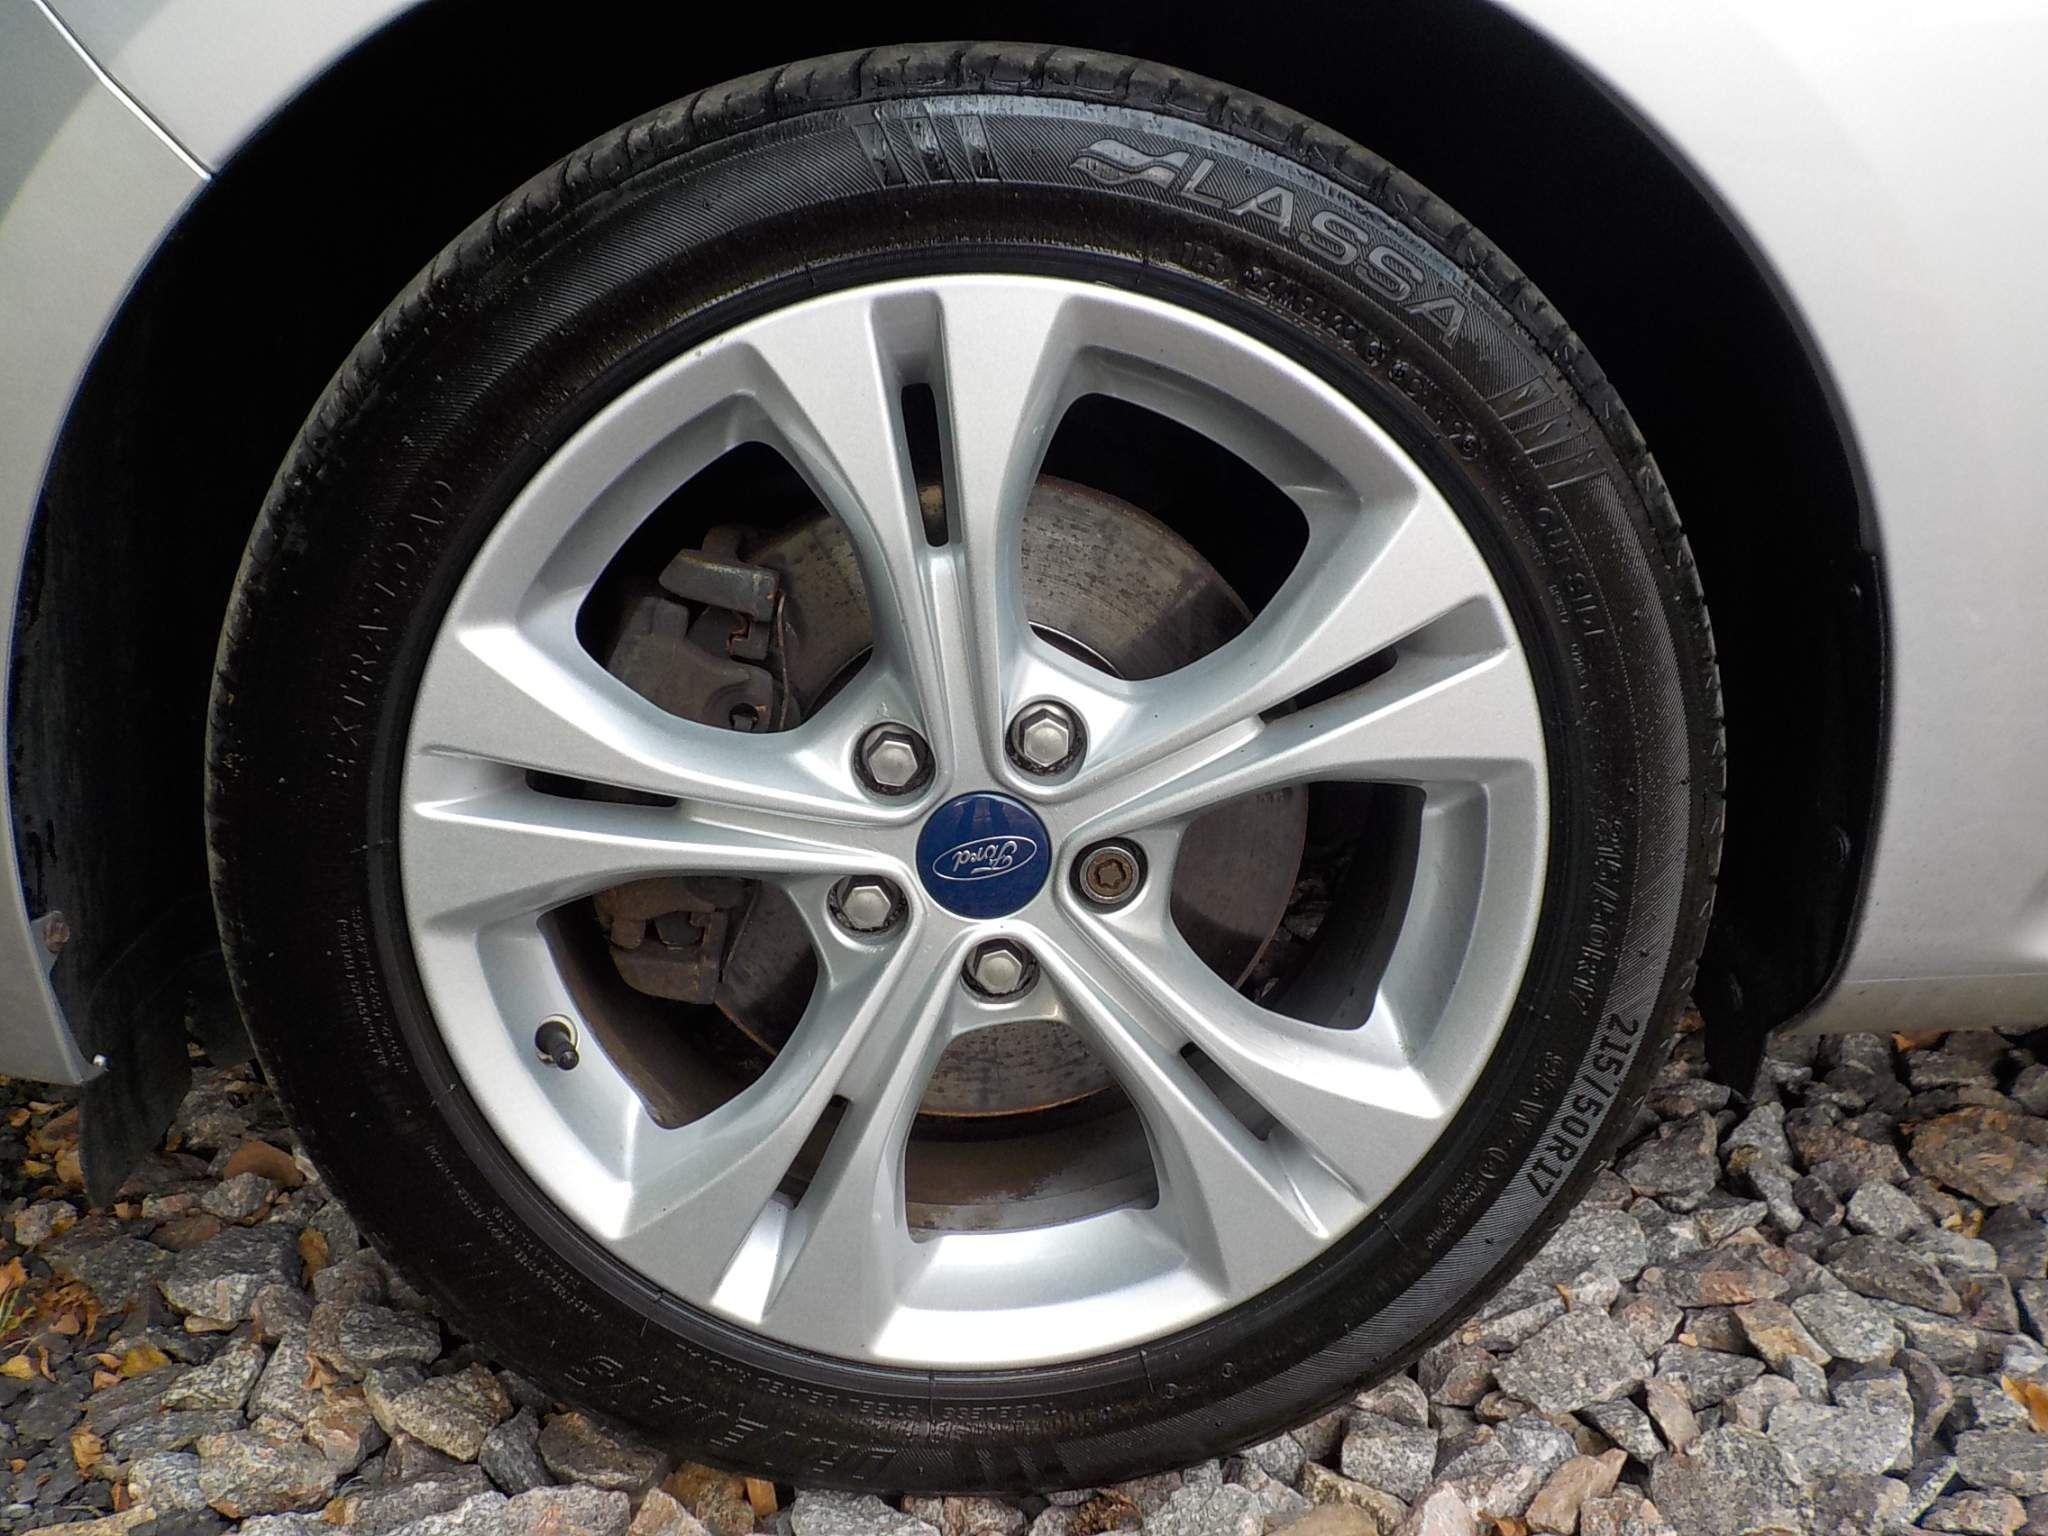 Ford Mondeo 2.0 TDCi Titanium X Business Powershift 5dr